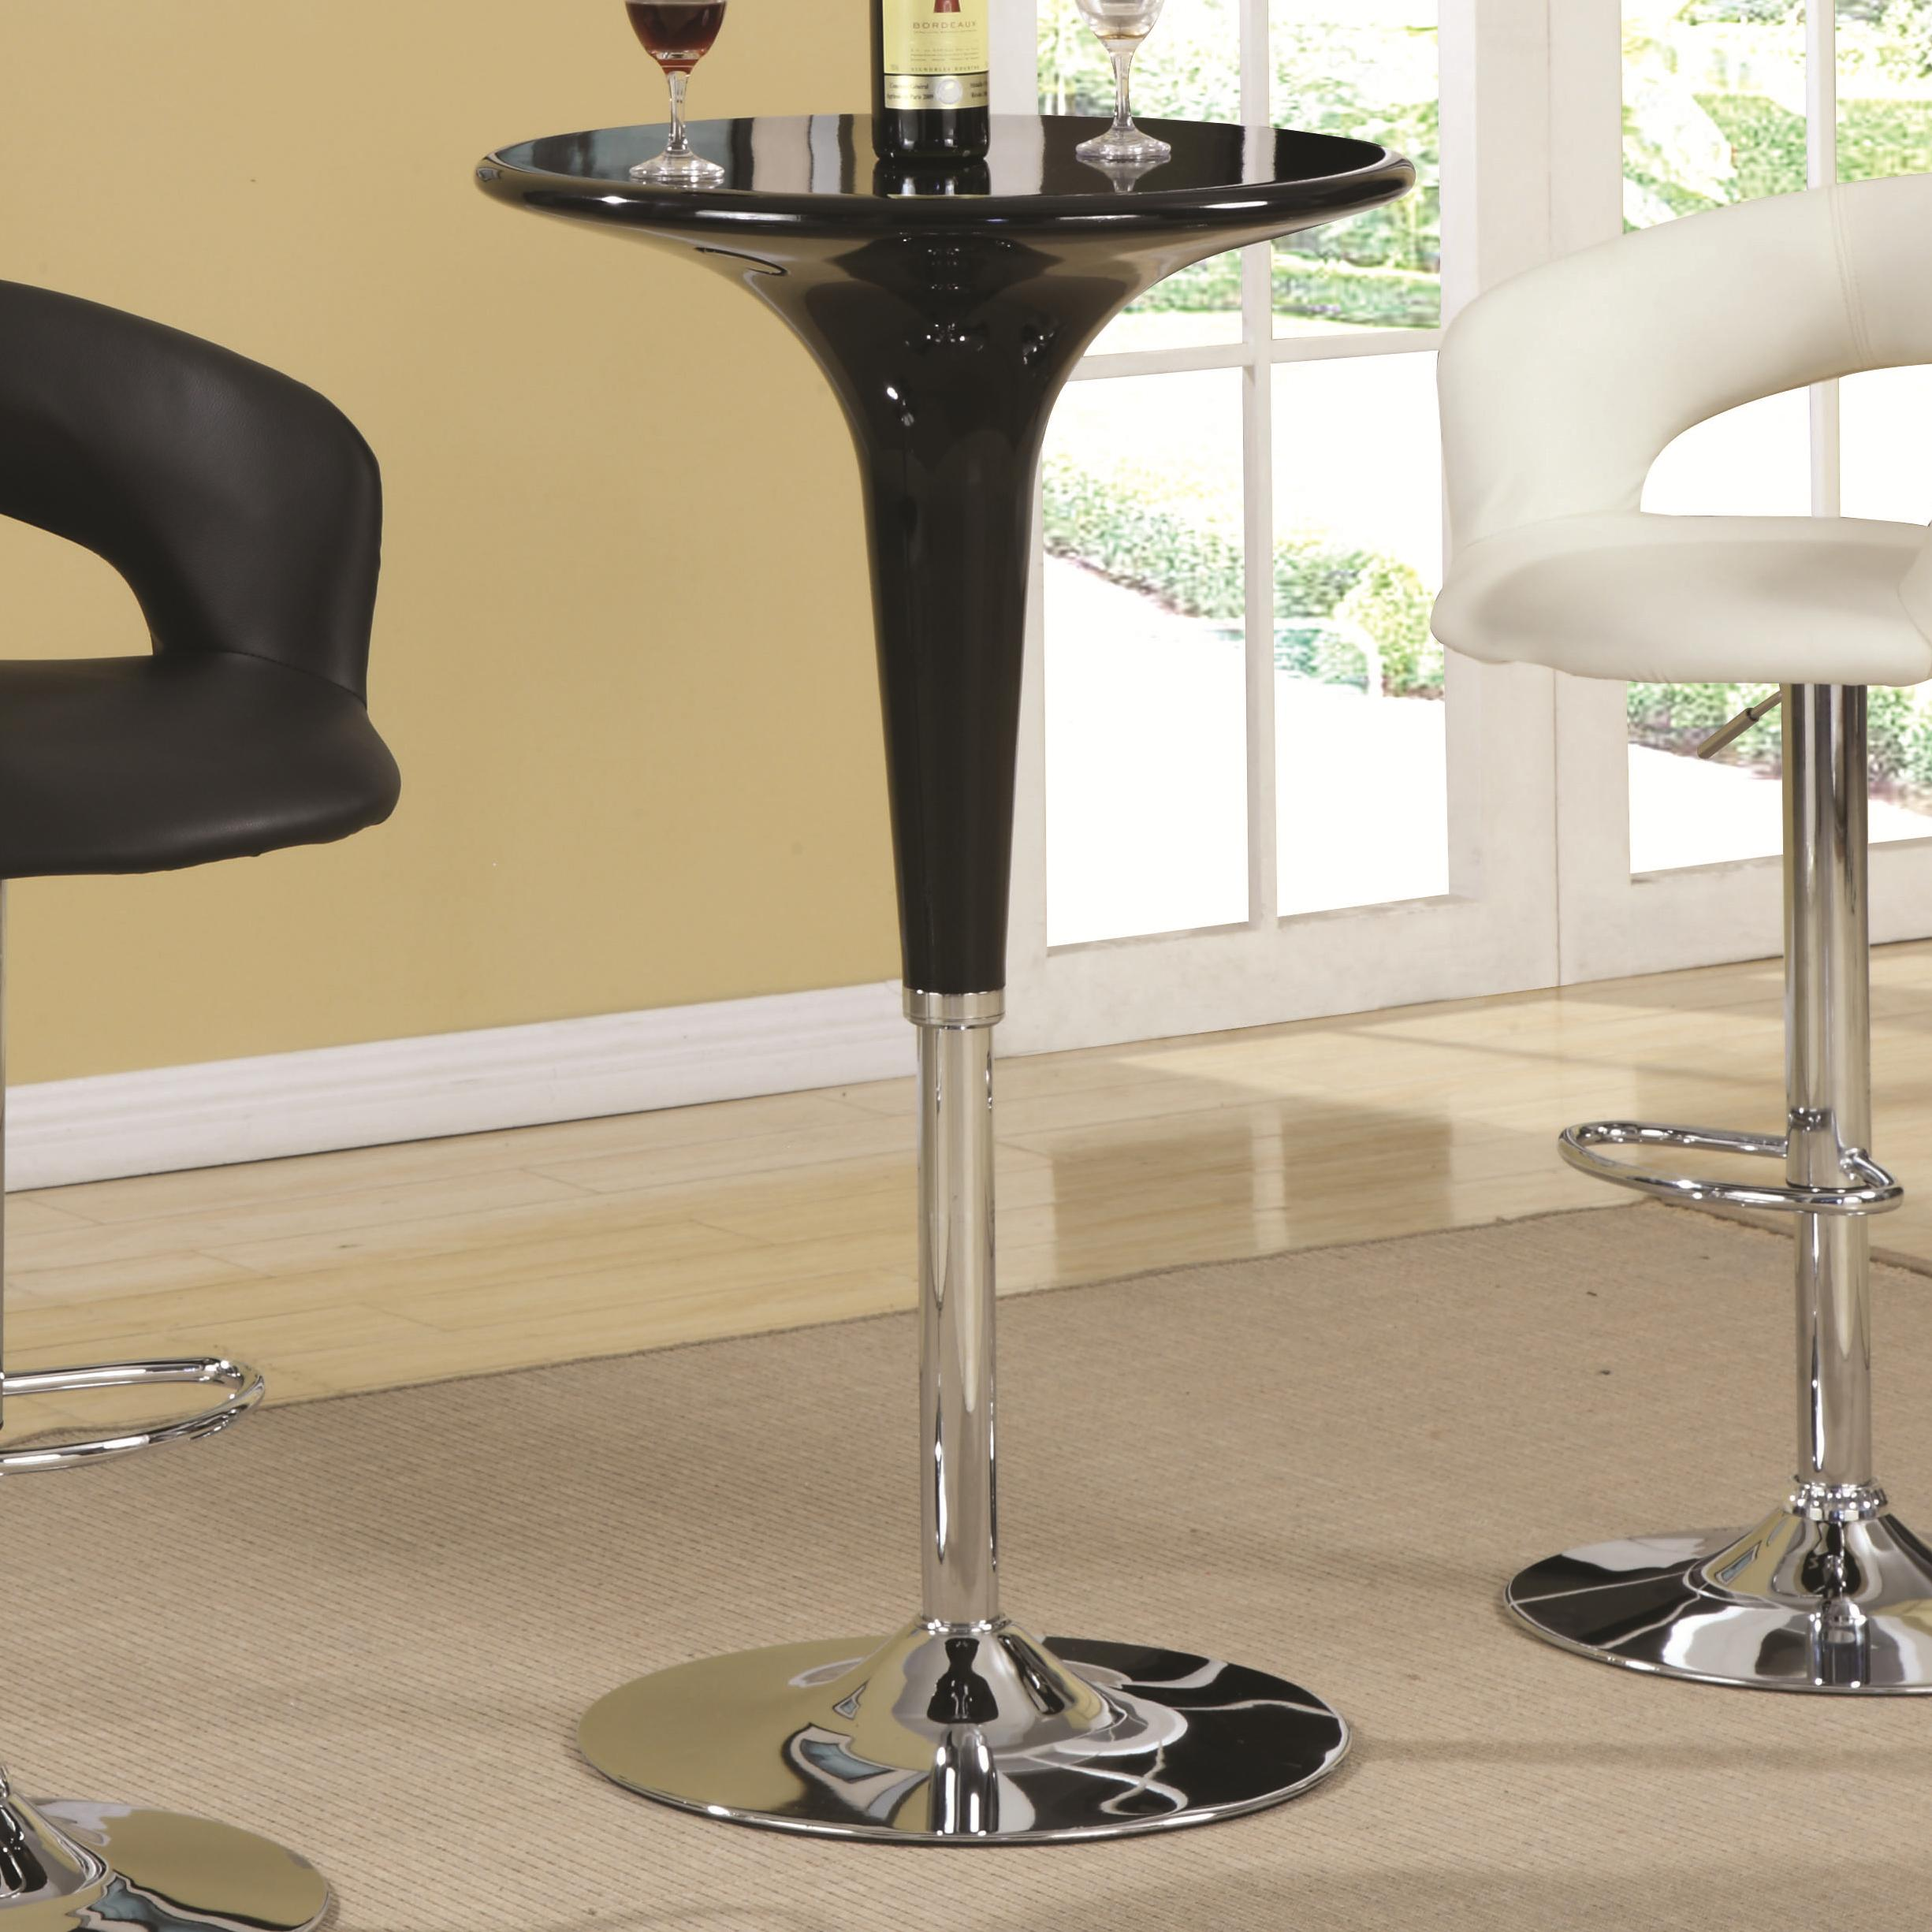 Coaster Bar Units and Bar Tables Adjustable Bar Table - Item Number: 120325